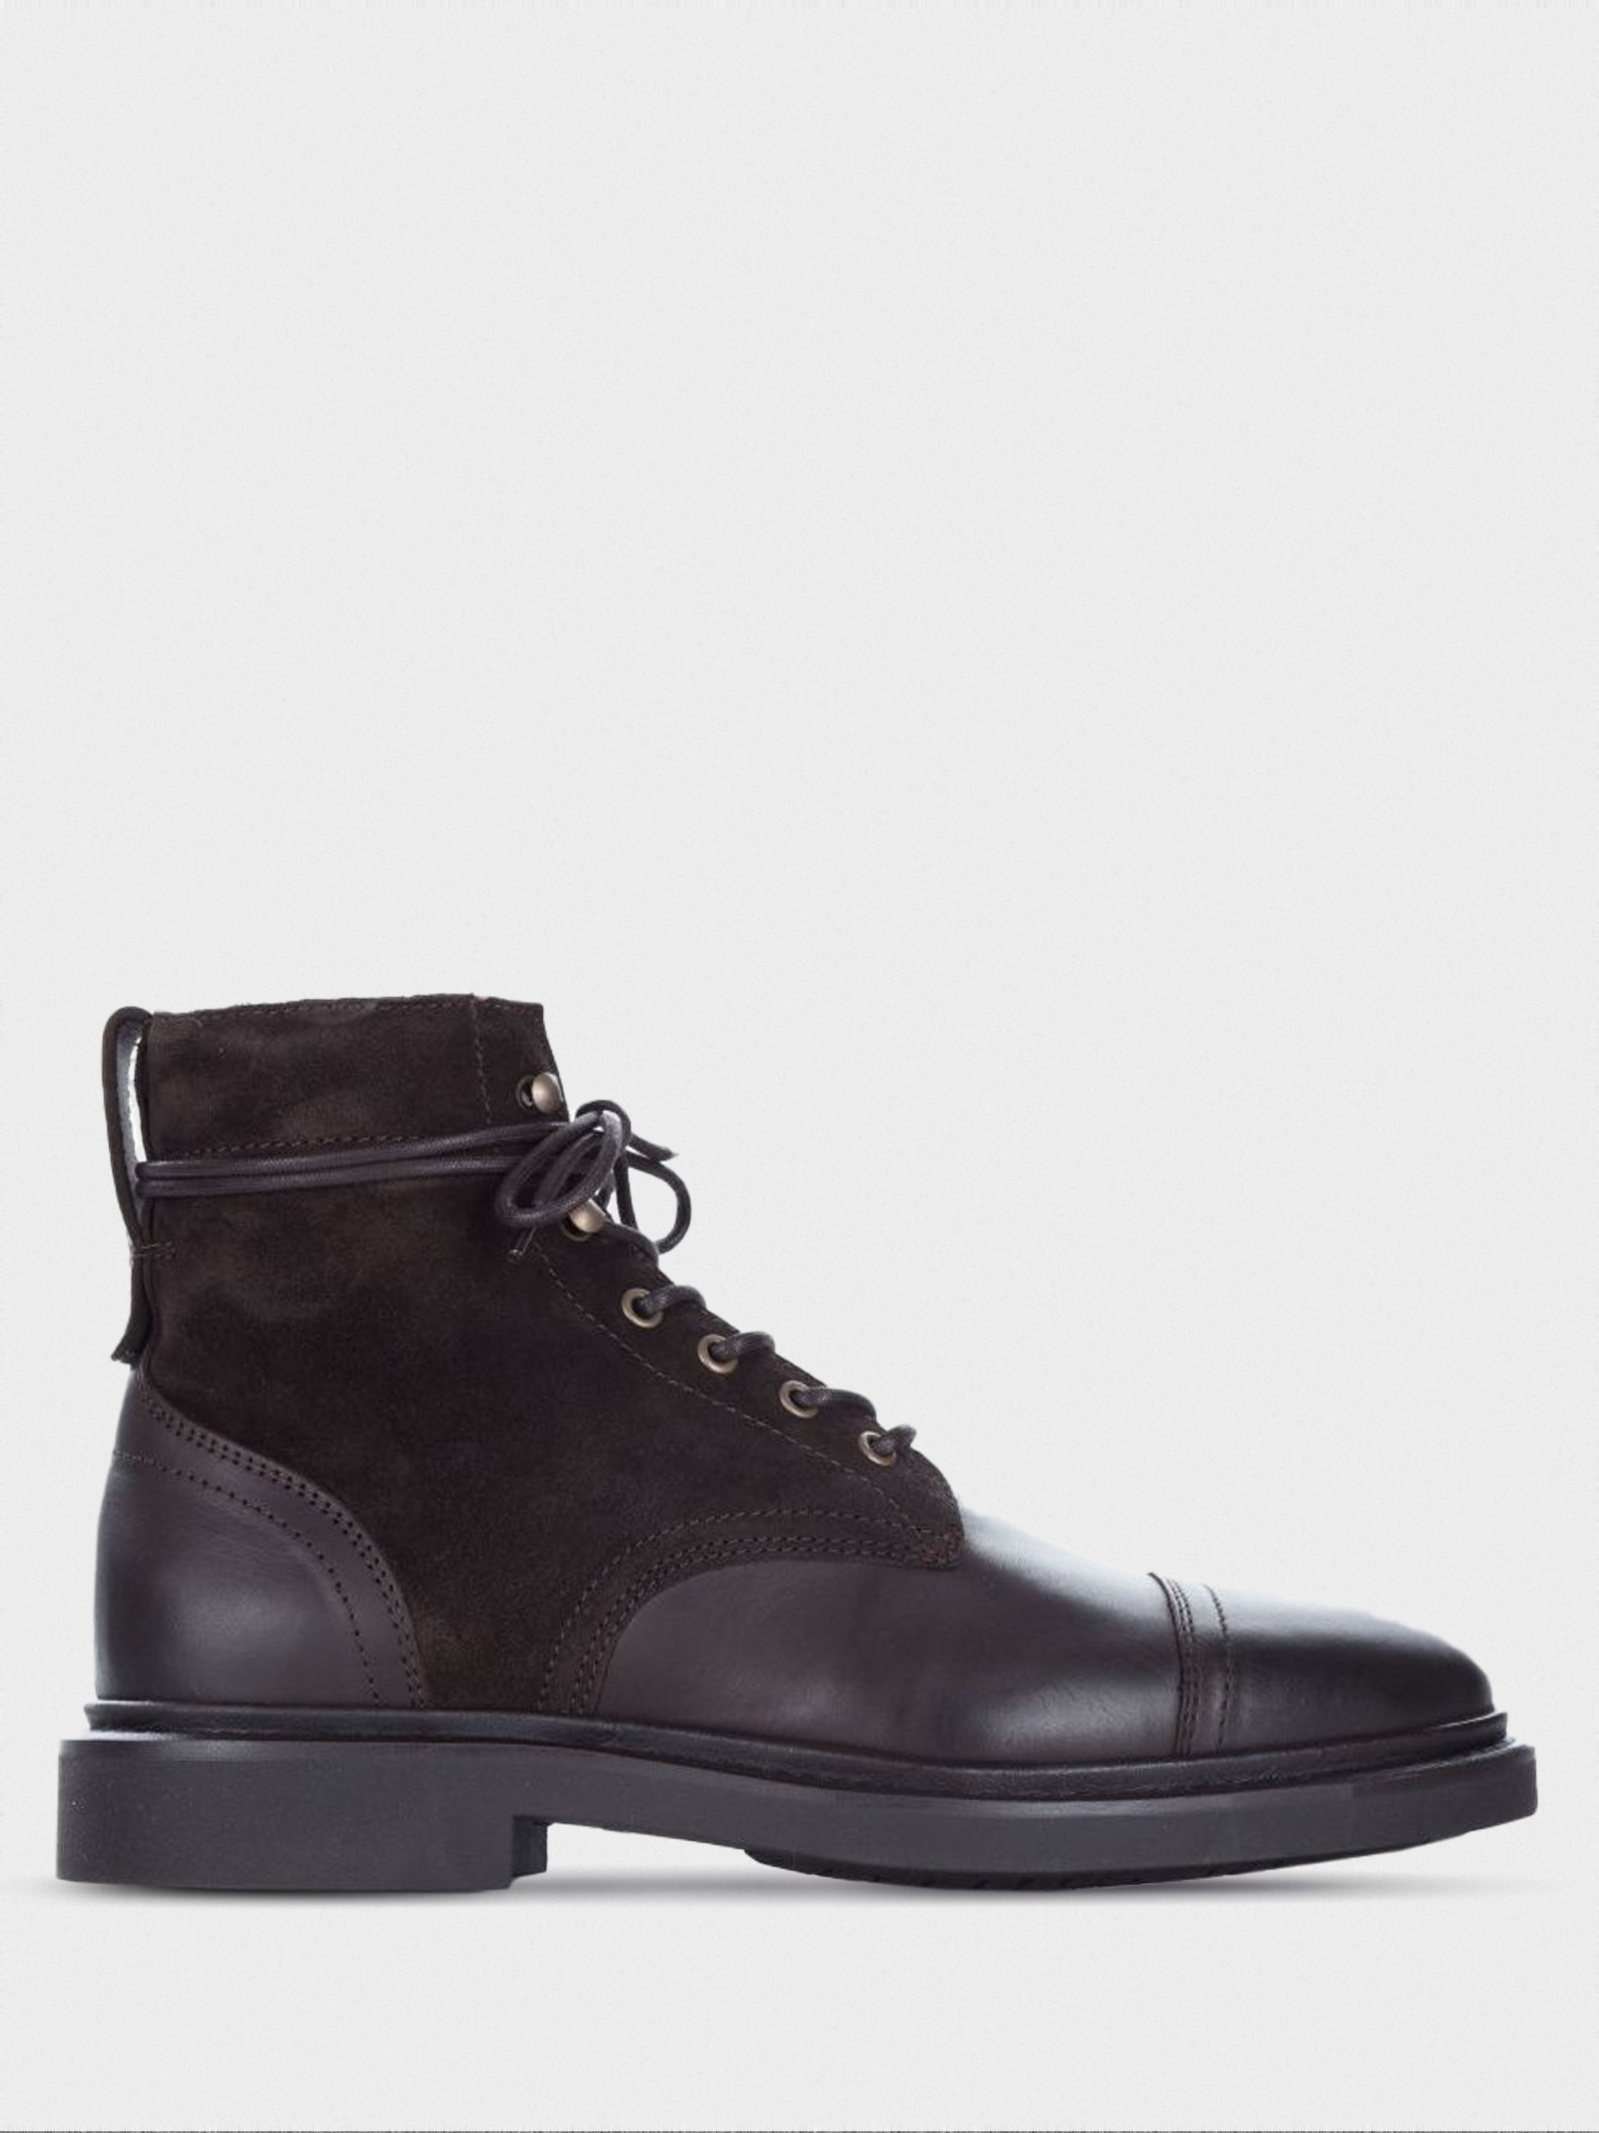 Ботинки мужские MARC O'POLO PO353 размерная сетка обуви, 2017